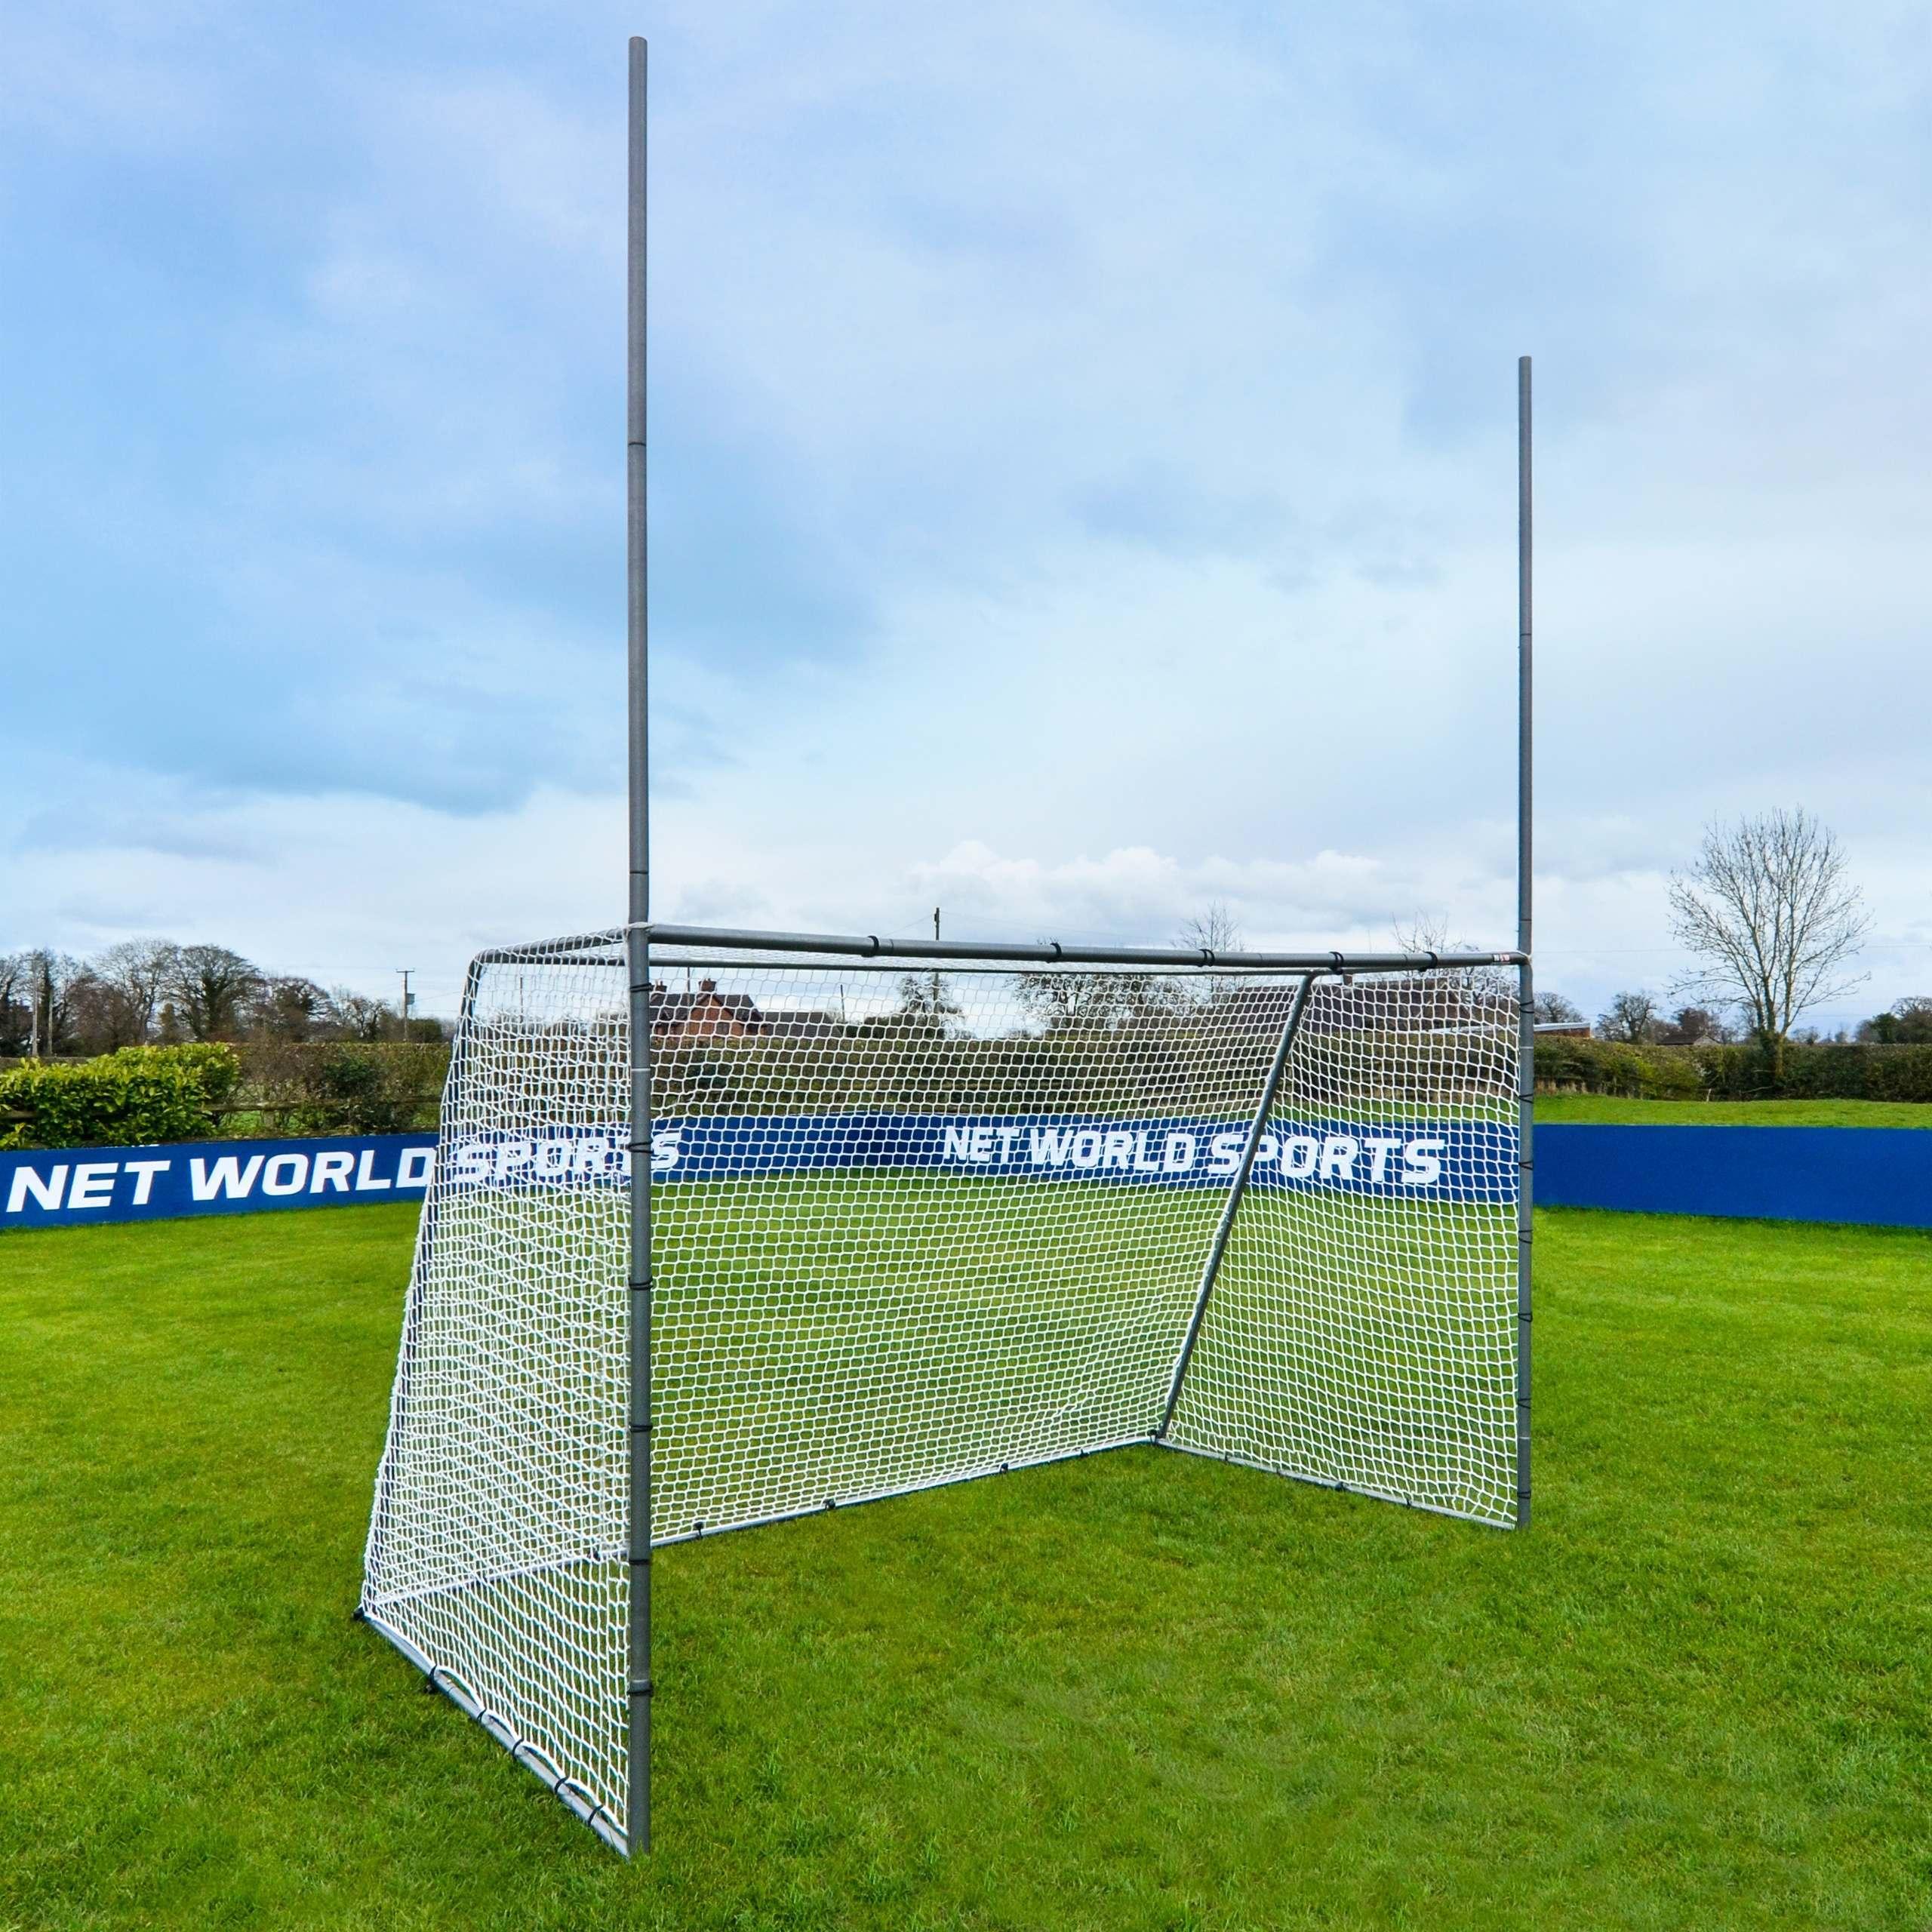 10 X 6 Forza Steel42 Combination Goal Net World Sports